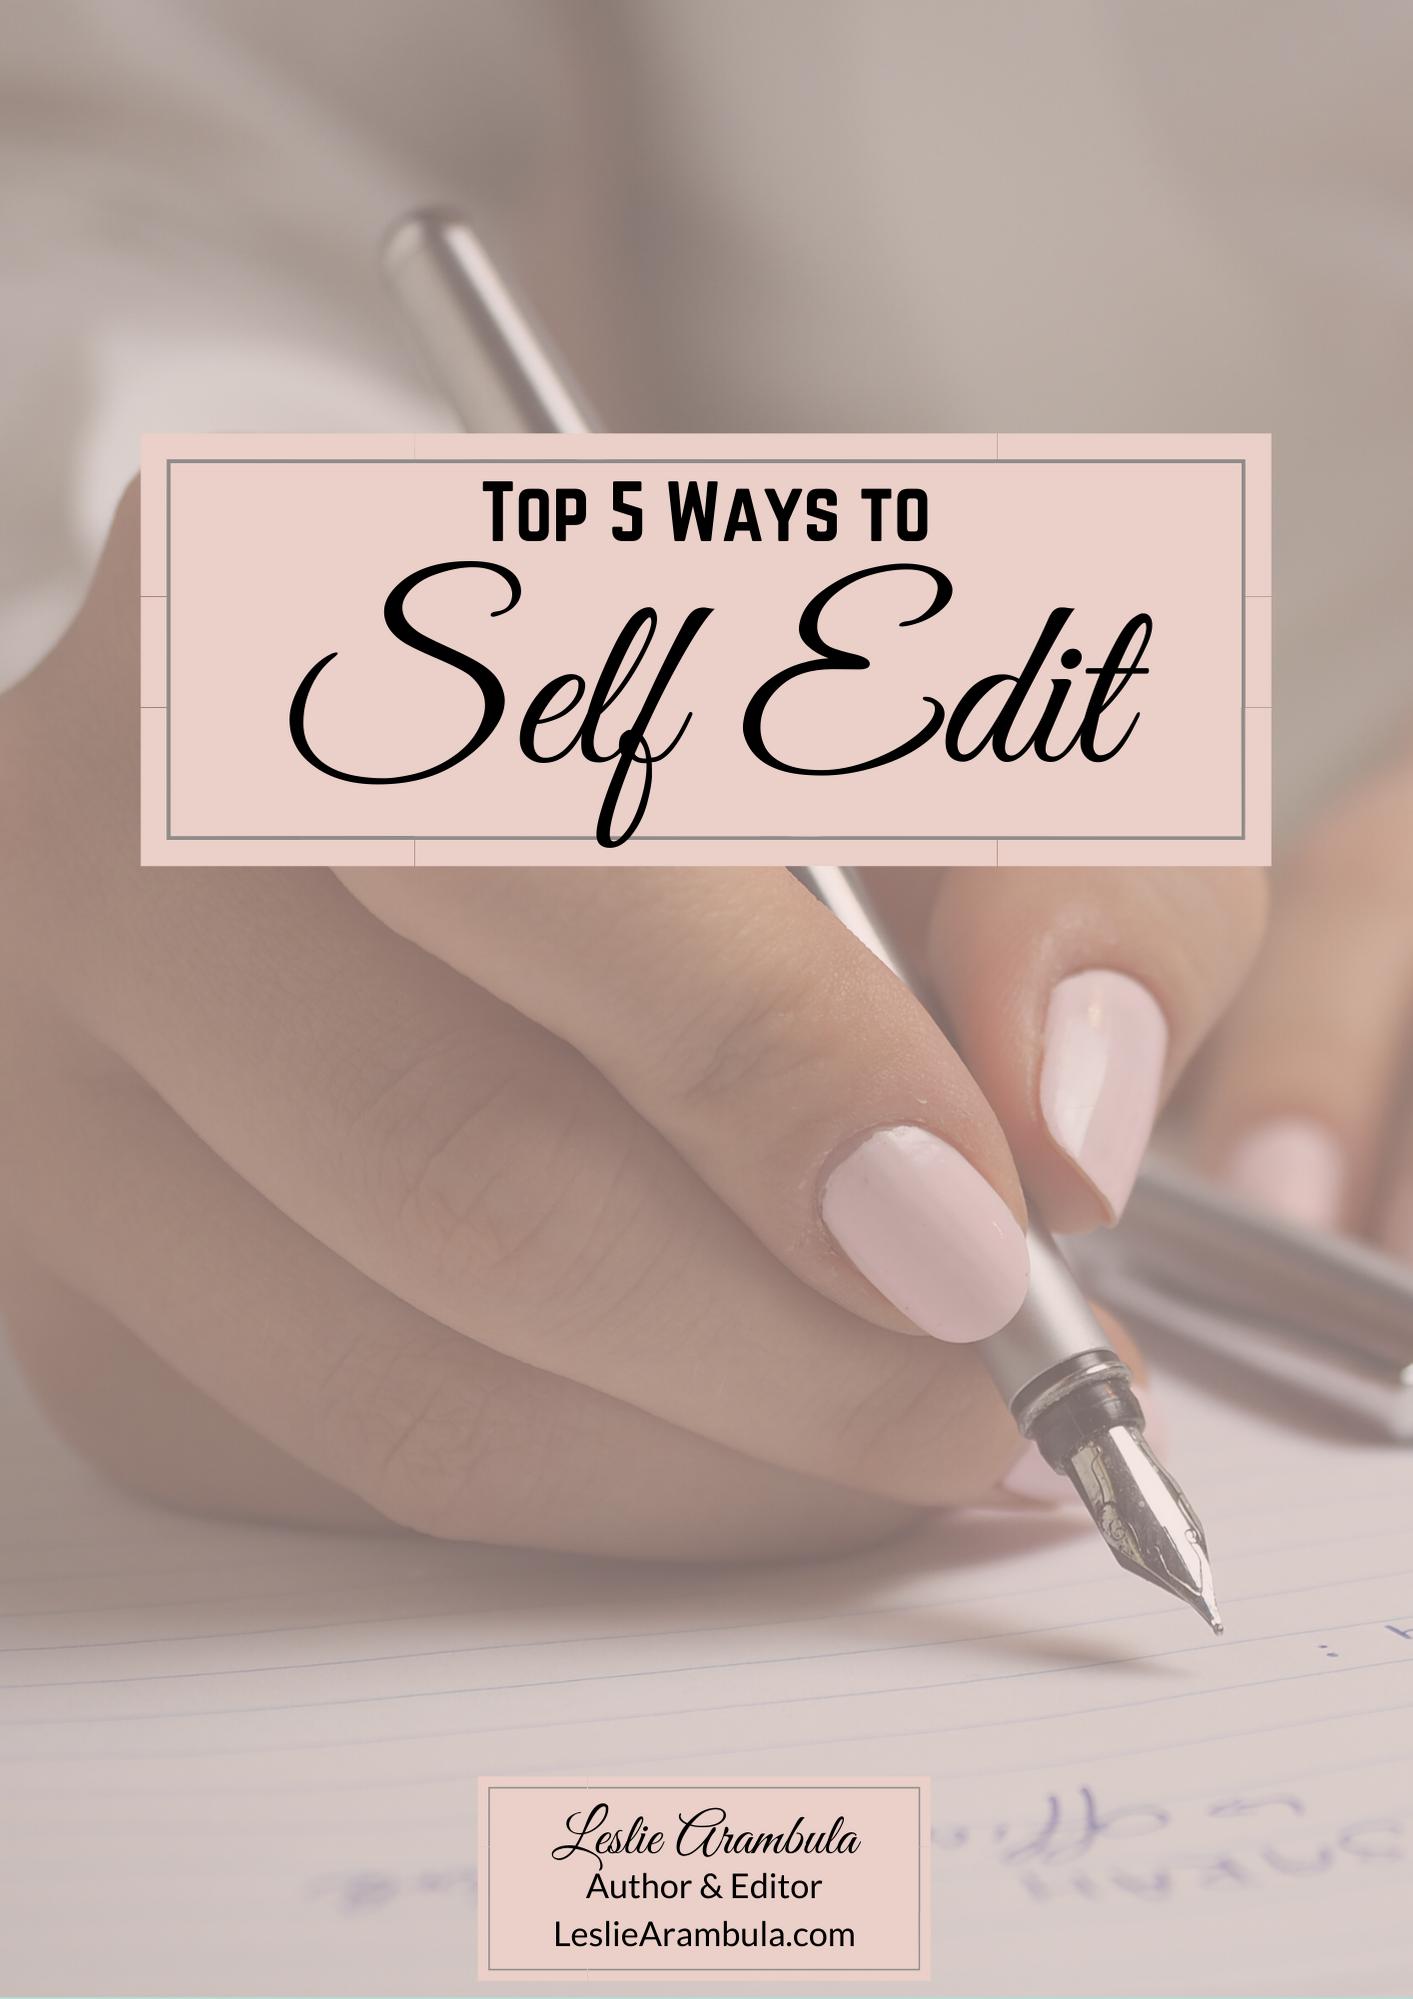 Leslie Arambula's self editing workbook